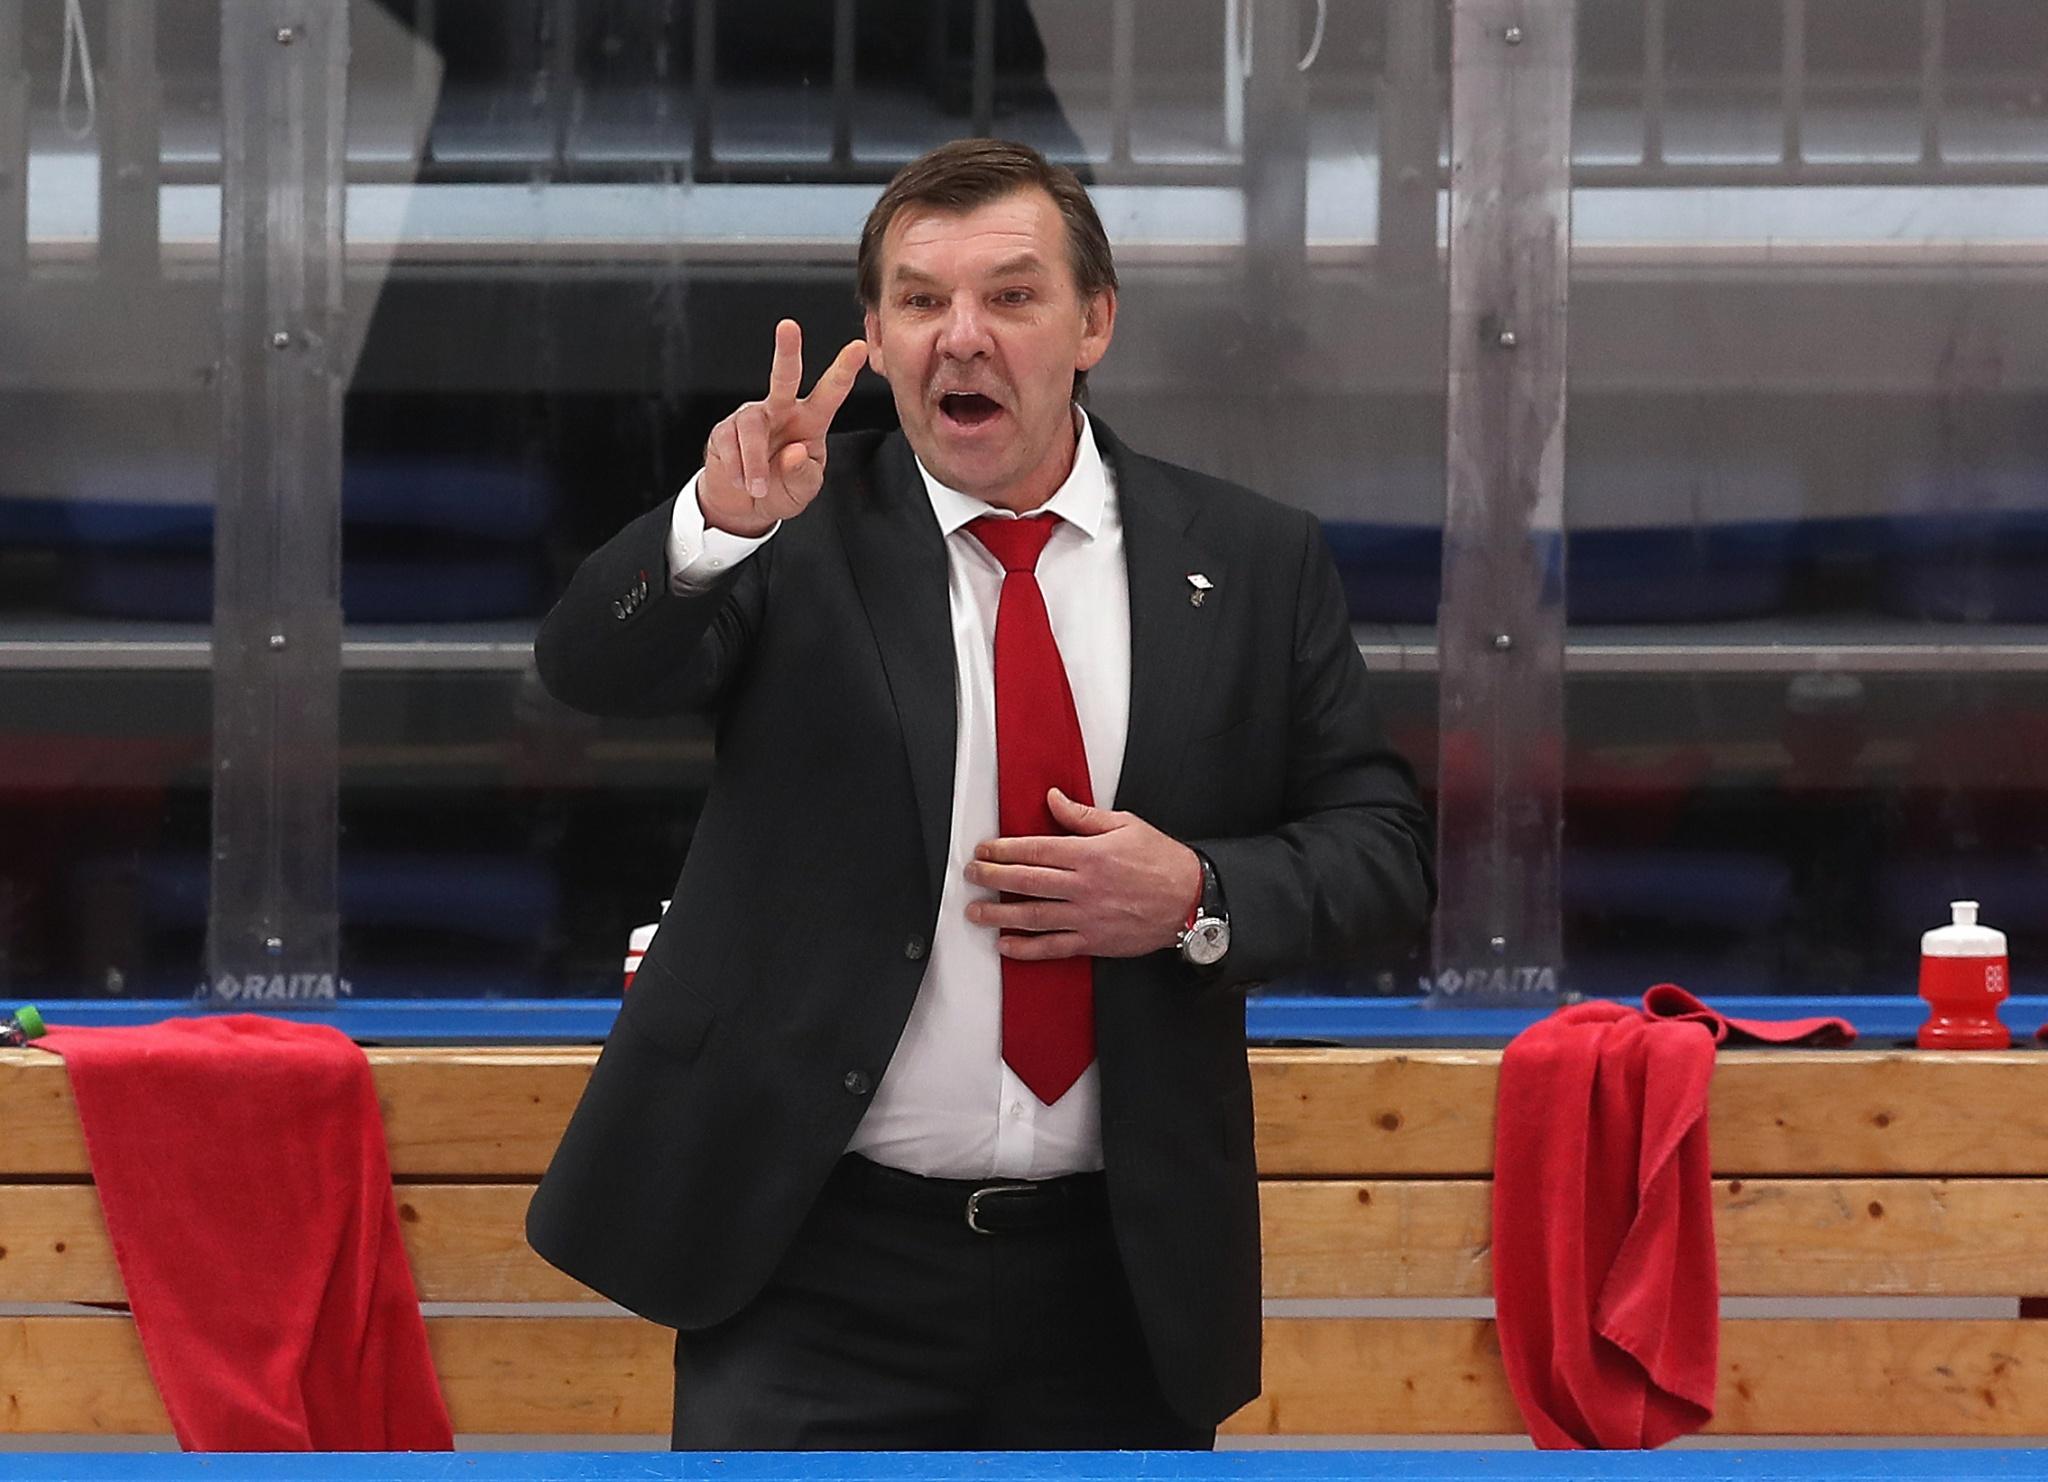 Главный тренер Спартака Олег Знарок. Фото: Юрий Кузьмин